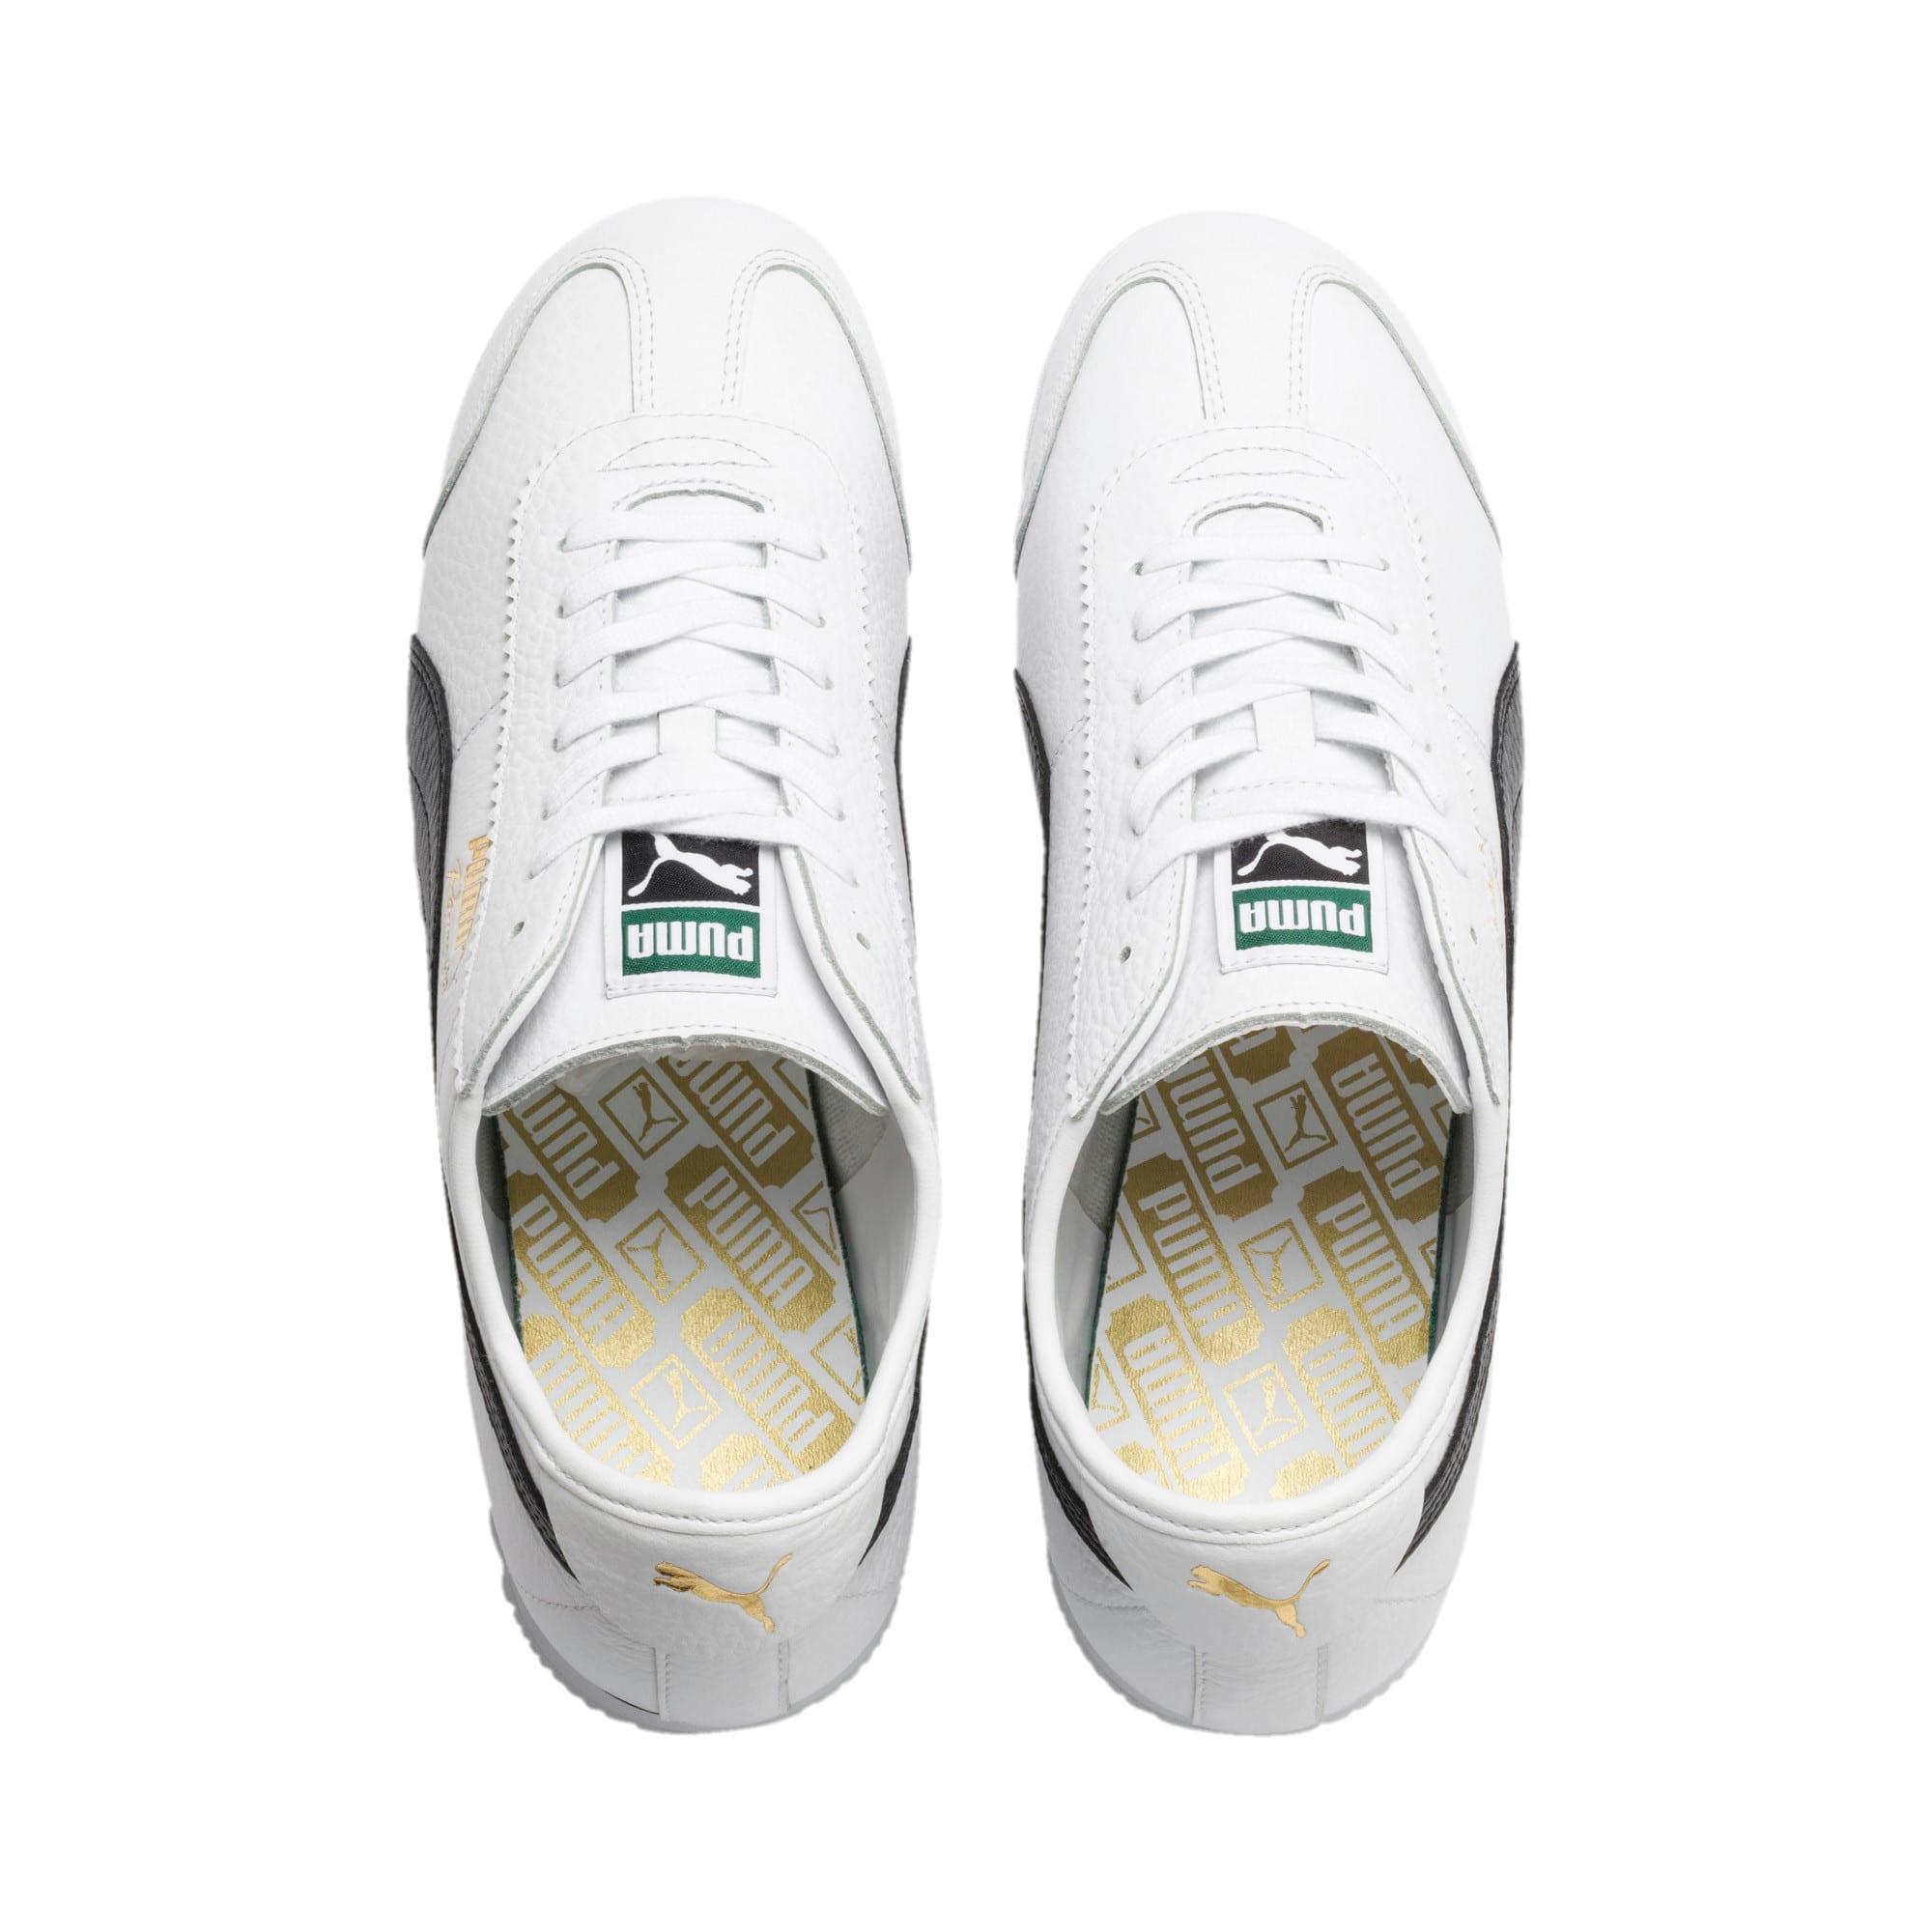 Thumbnail 7 of Roma '68 Vintage Sneakers, Puma White-Puma Black, medium